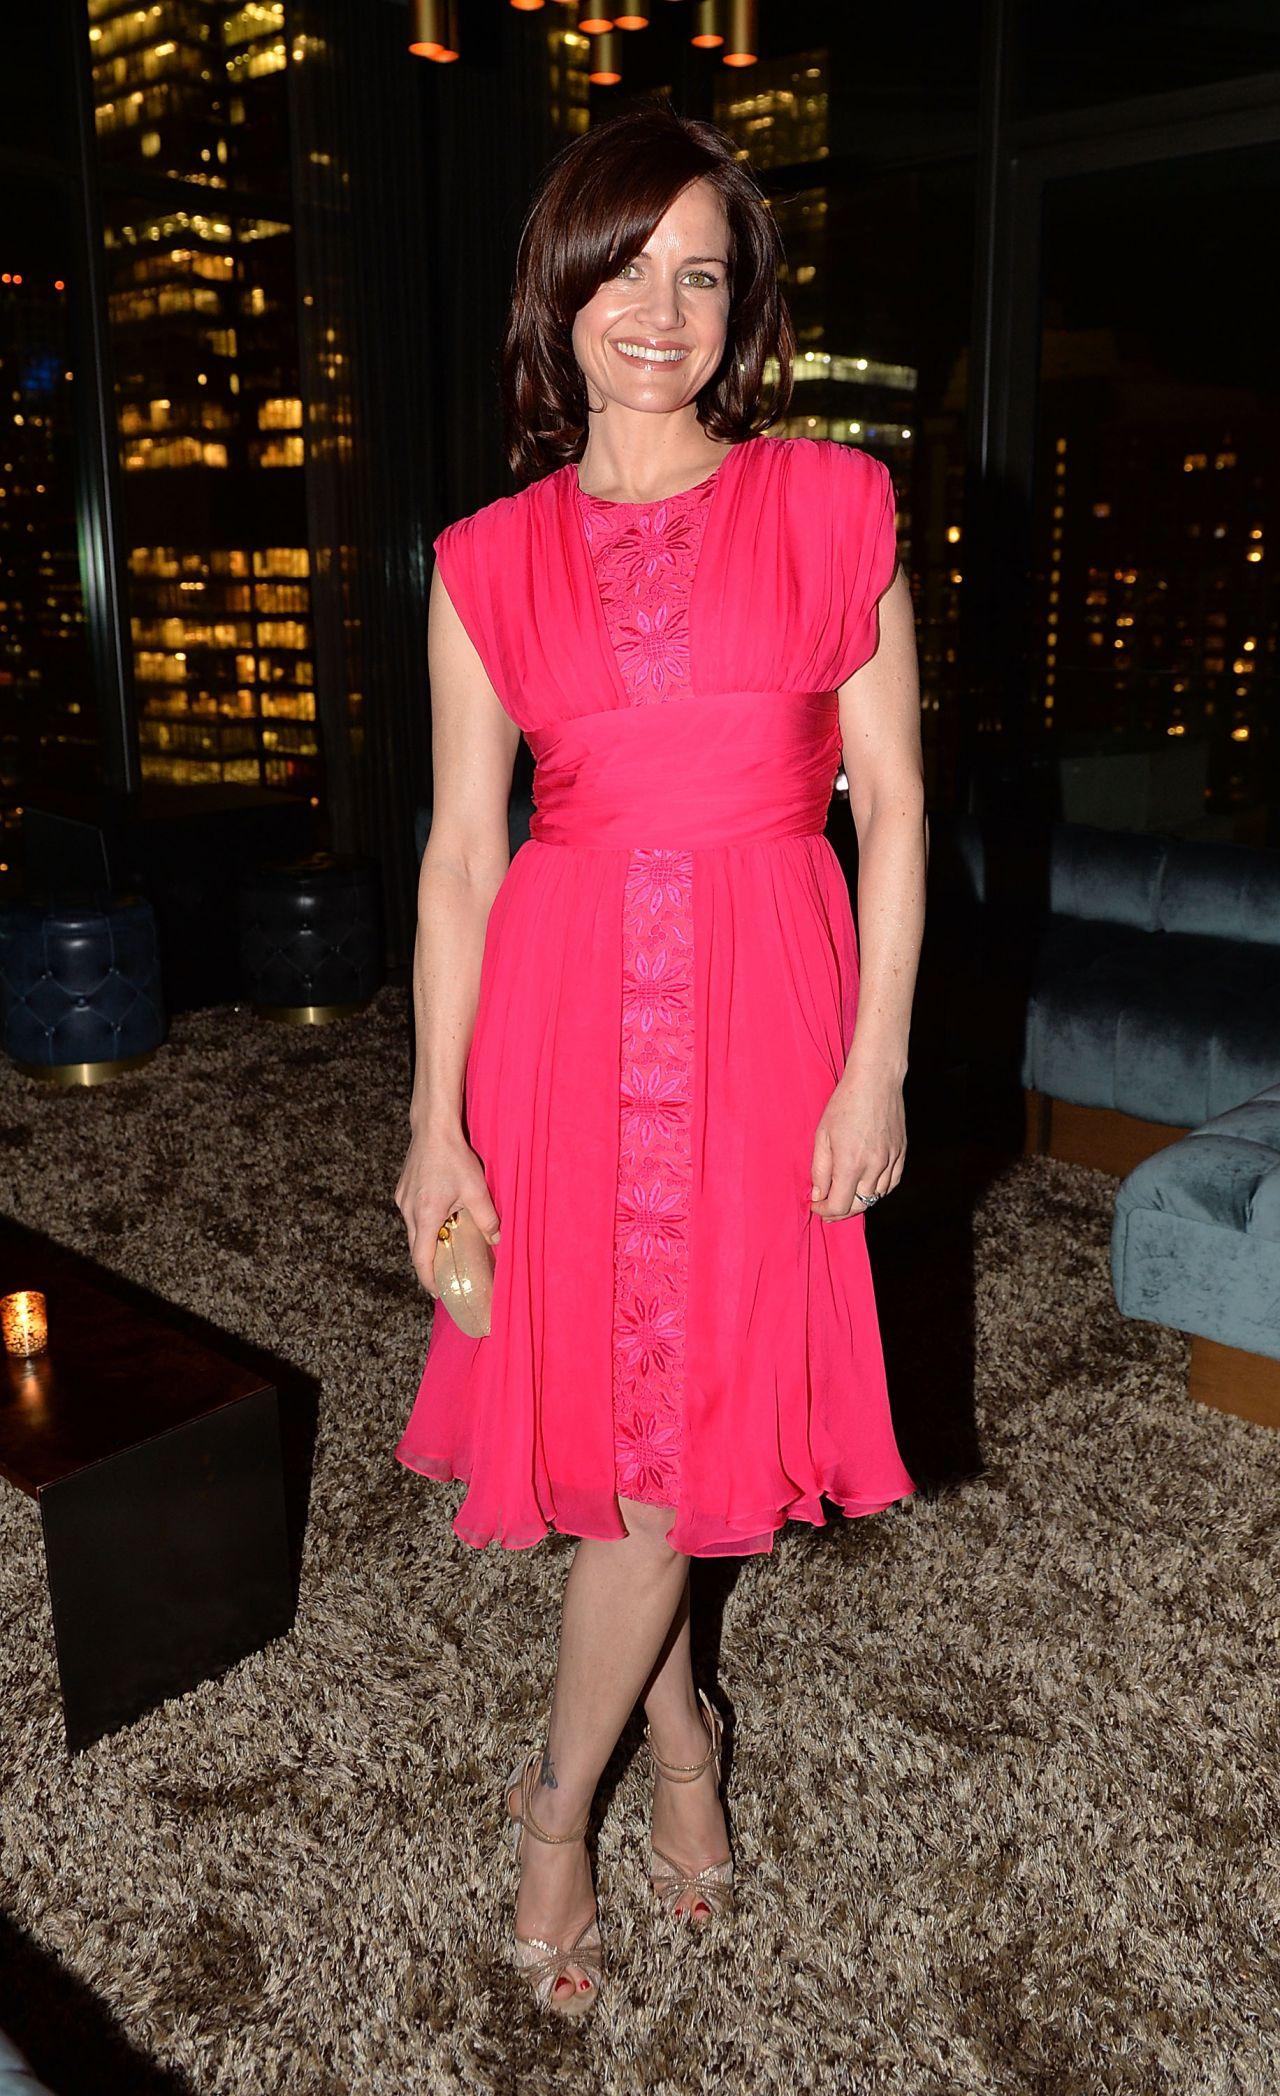 Carla Gugino Premiere Of Philomena In New York